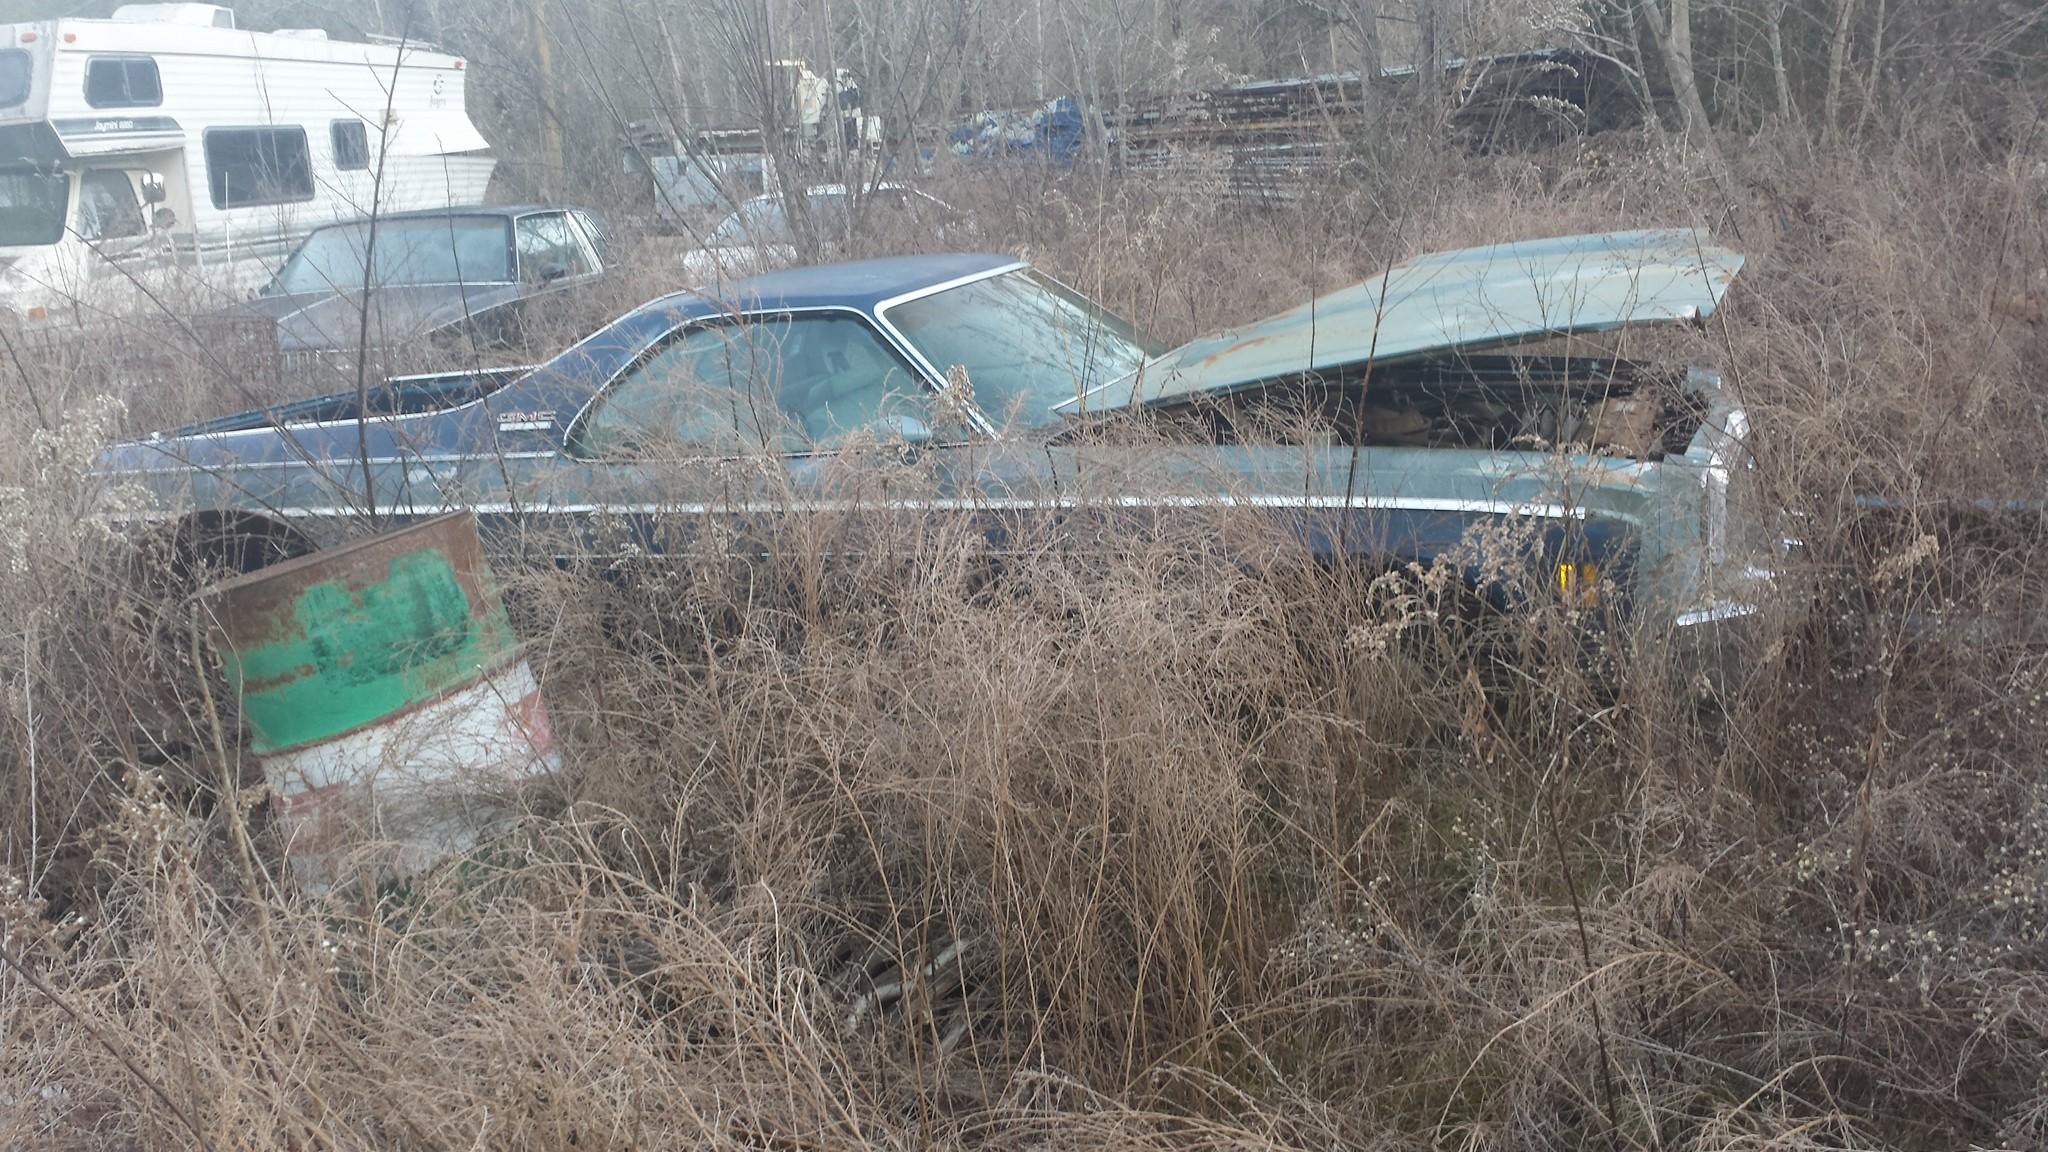 Half-car-half-truck-all-ugly-Newport-Tennesee[1]